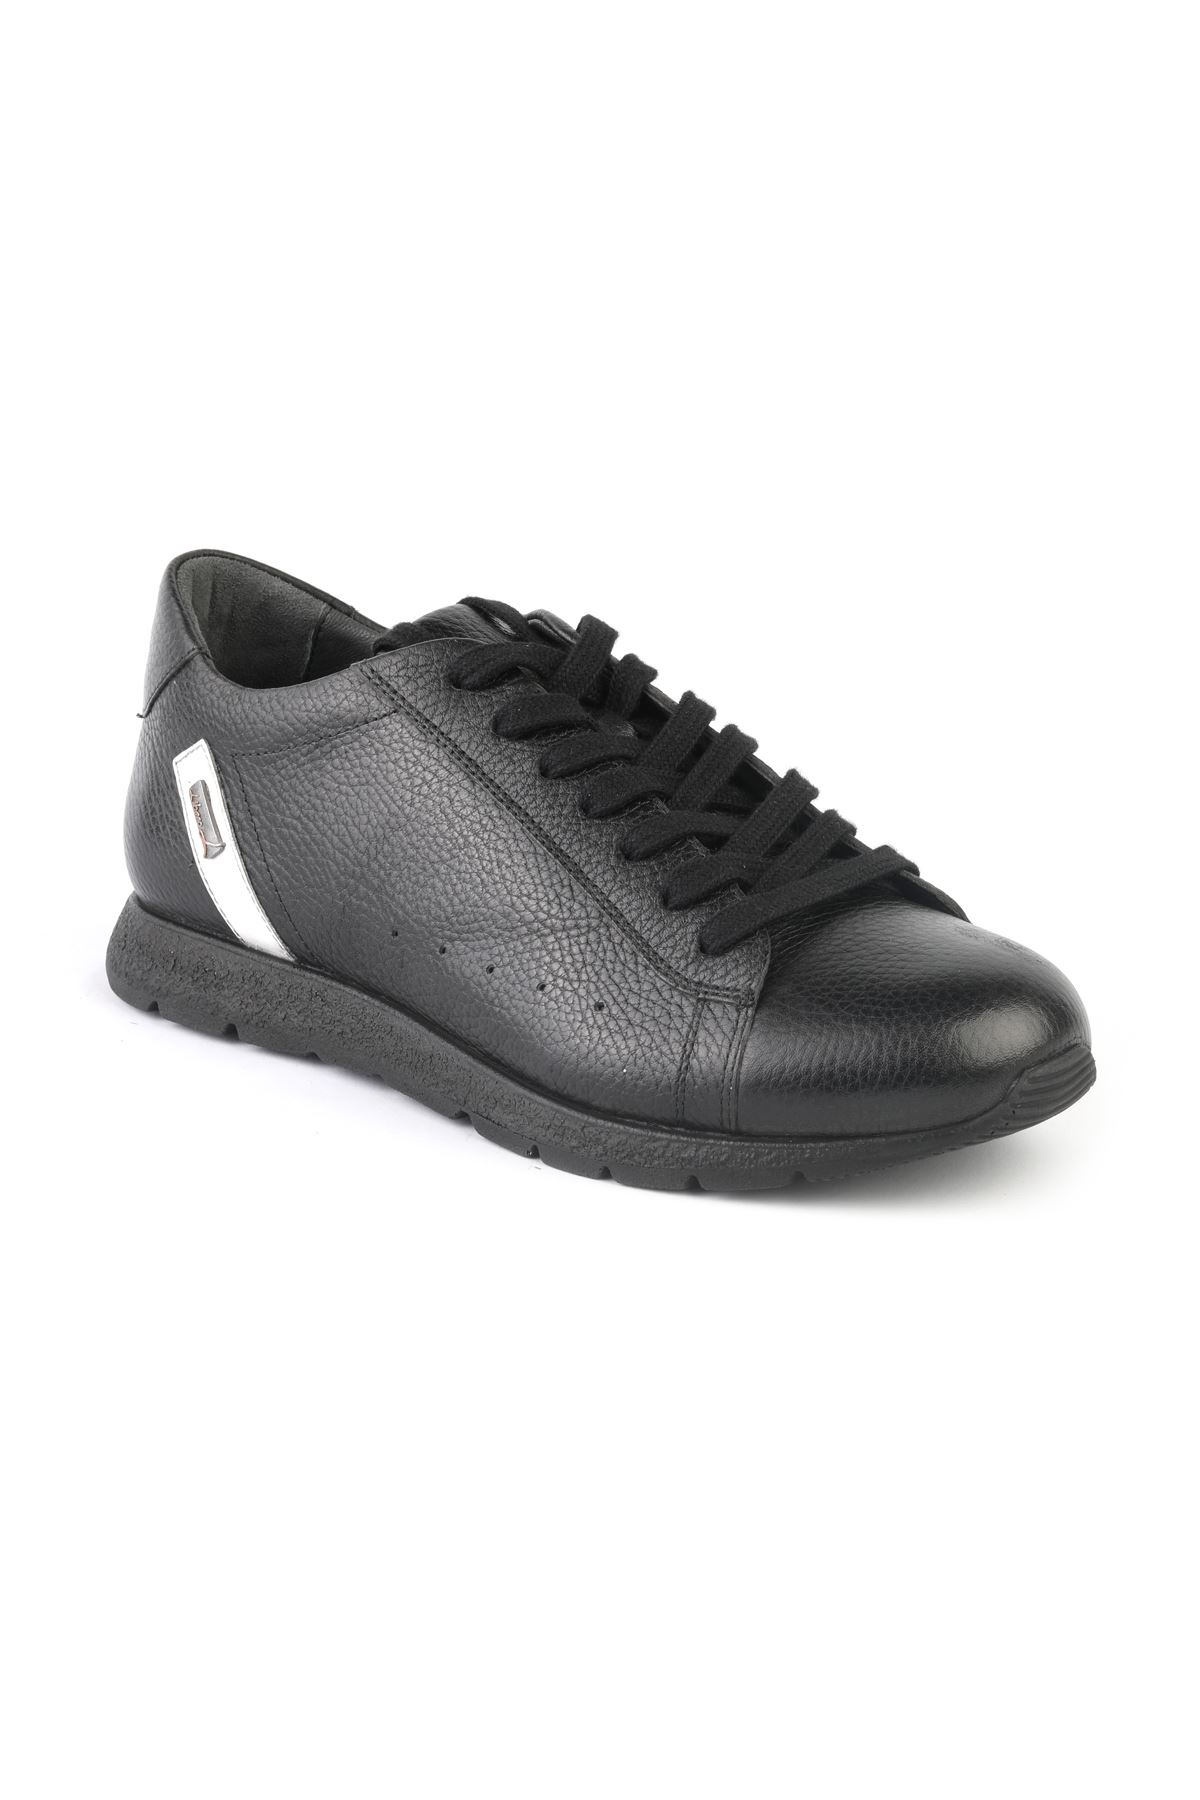 Libero T1187 Black Casual Sports Shoes